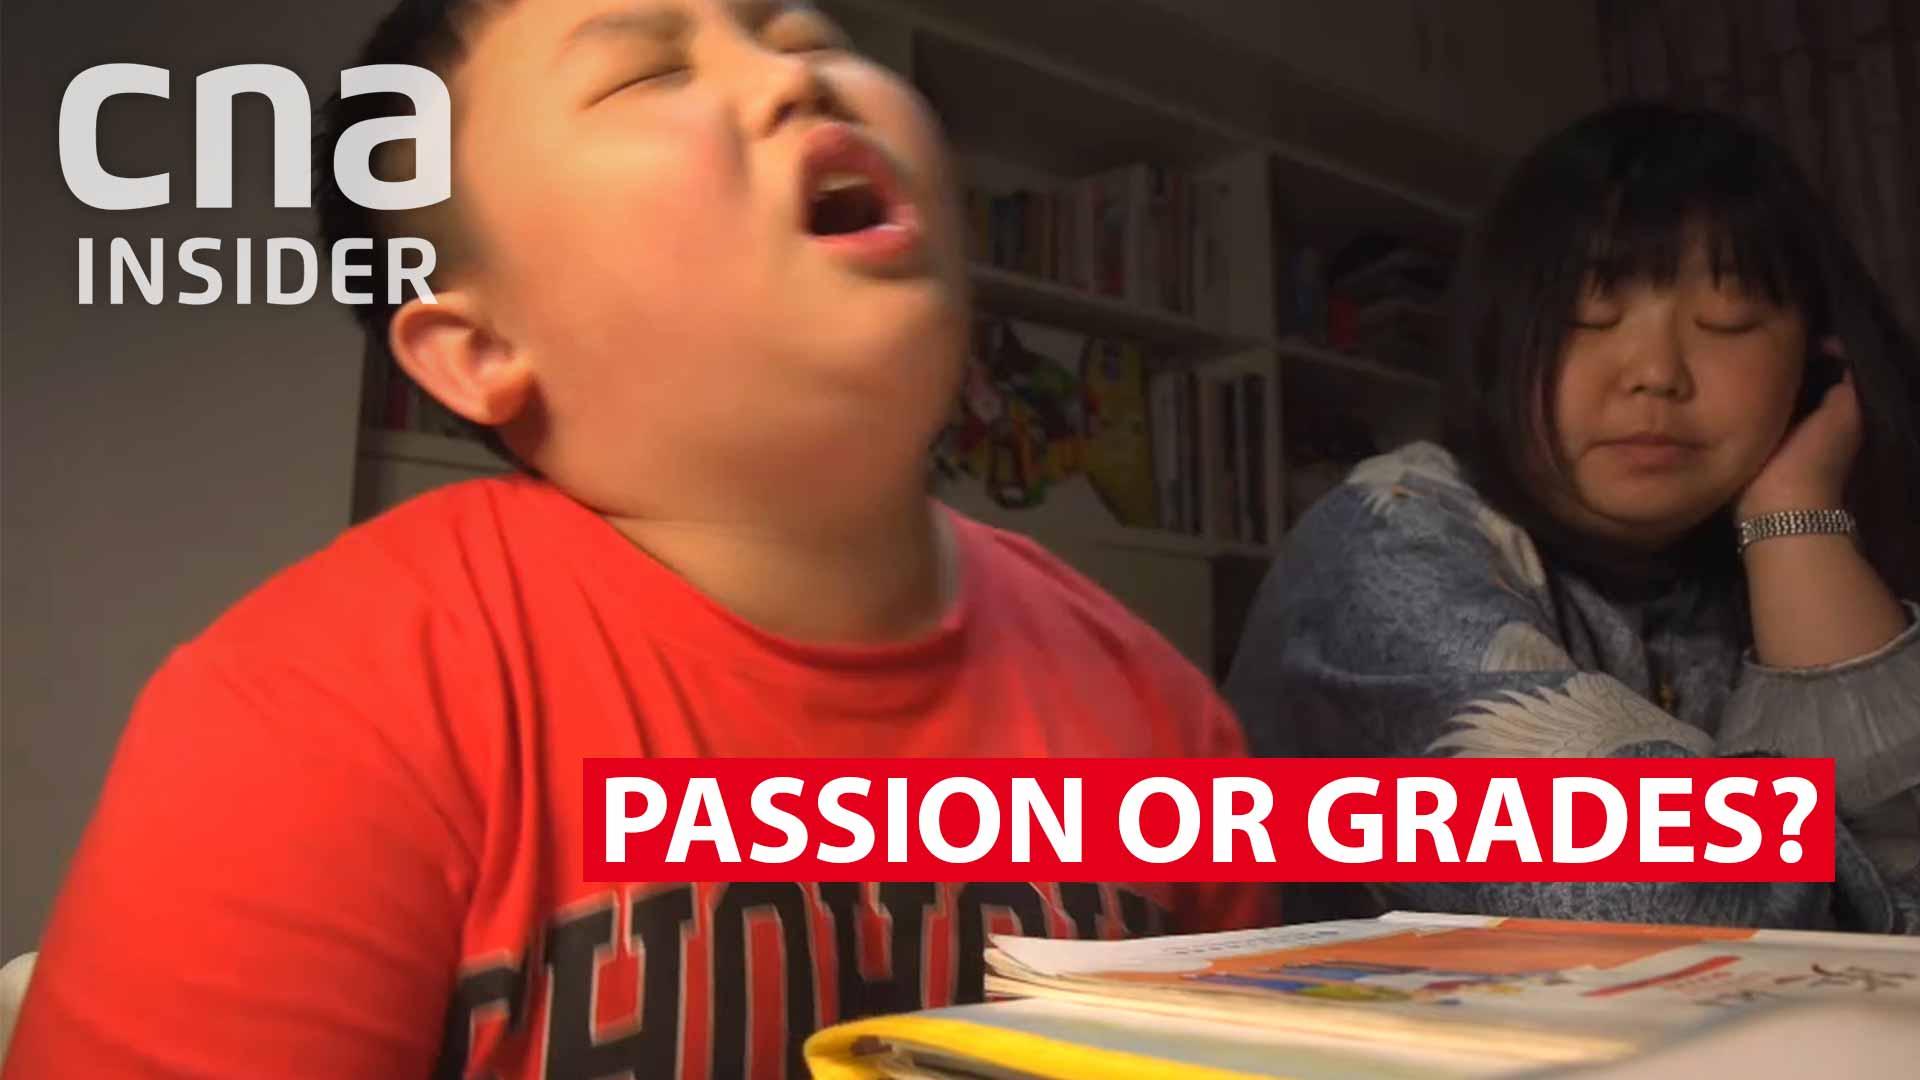 Passion or grades?